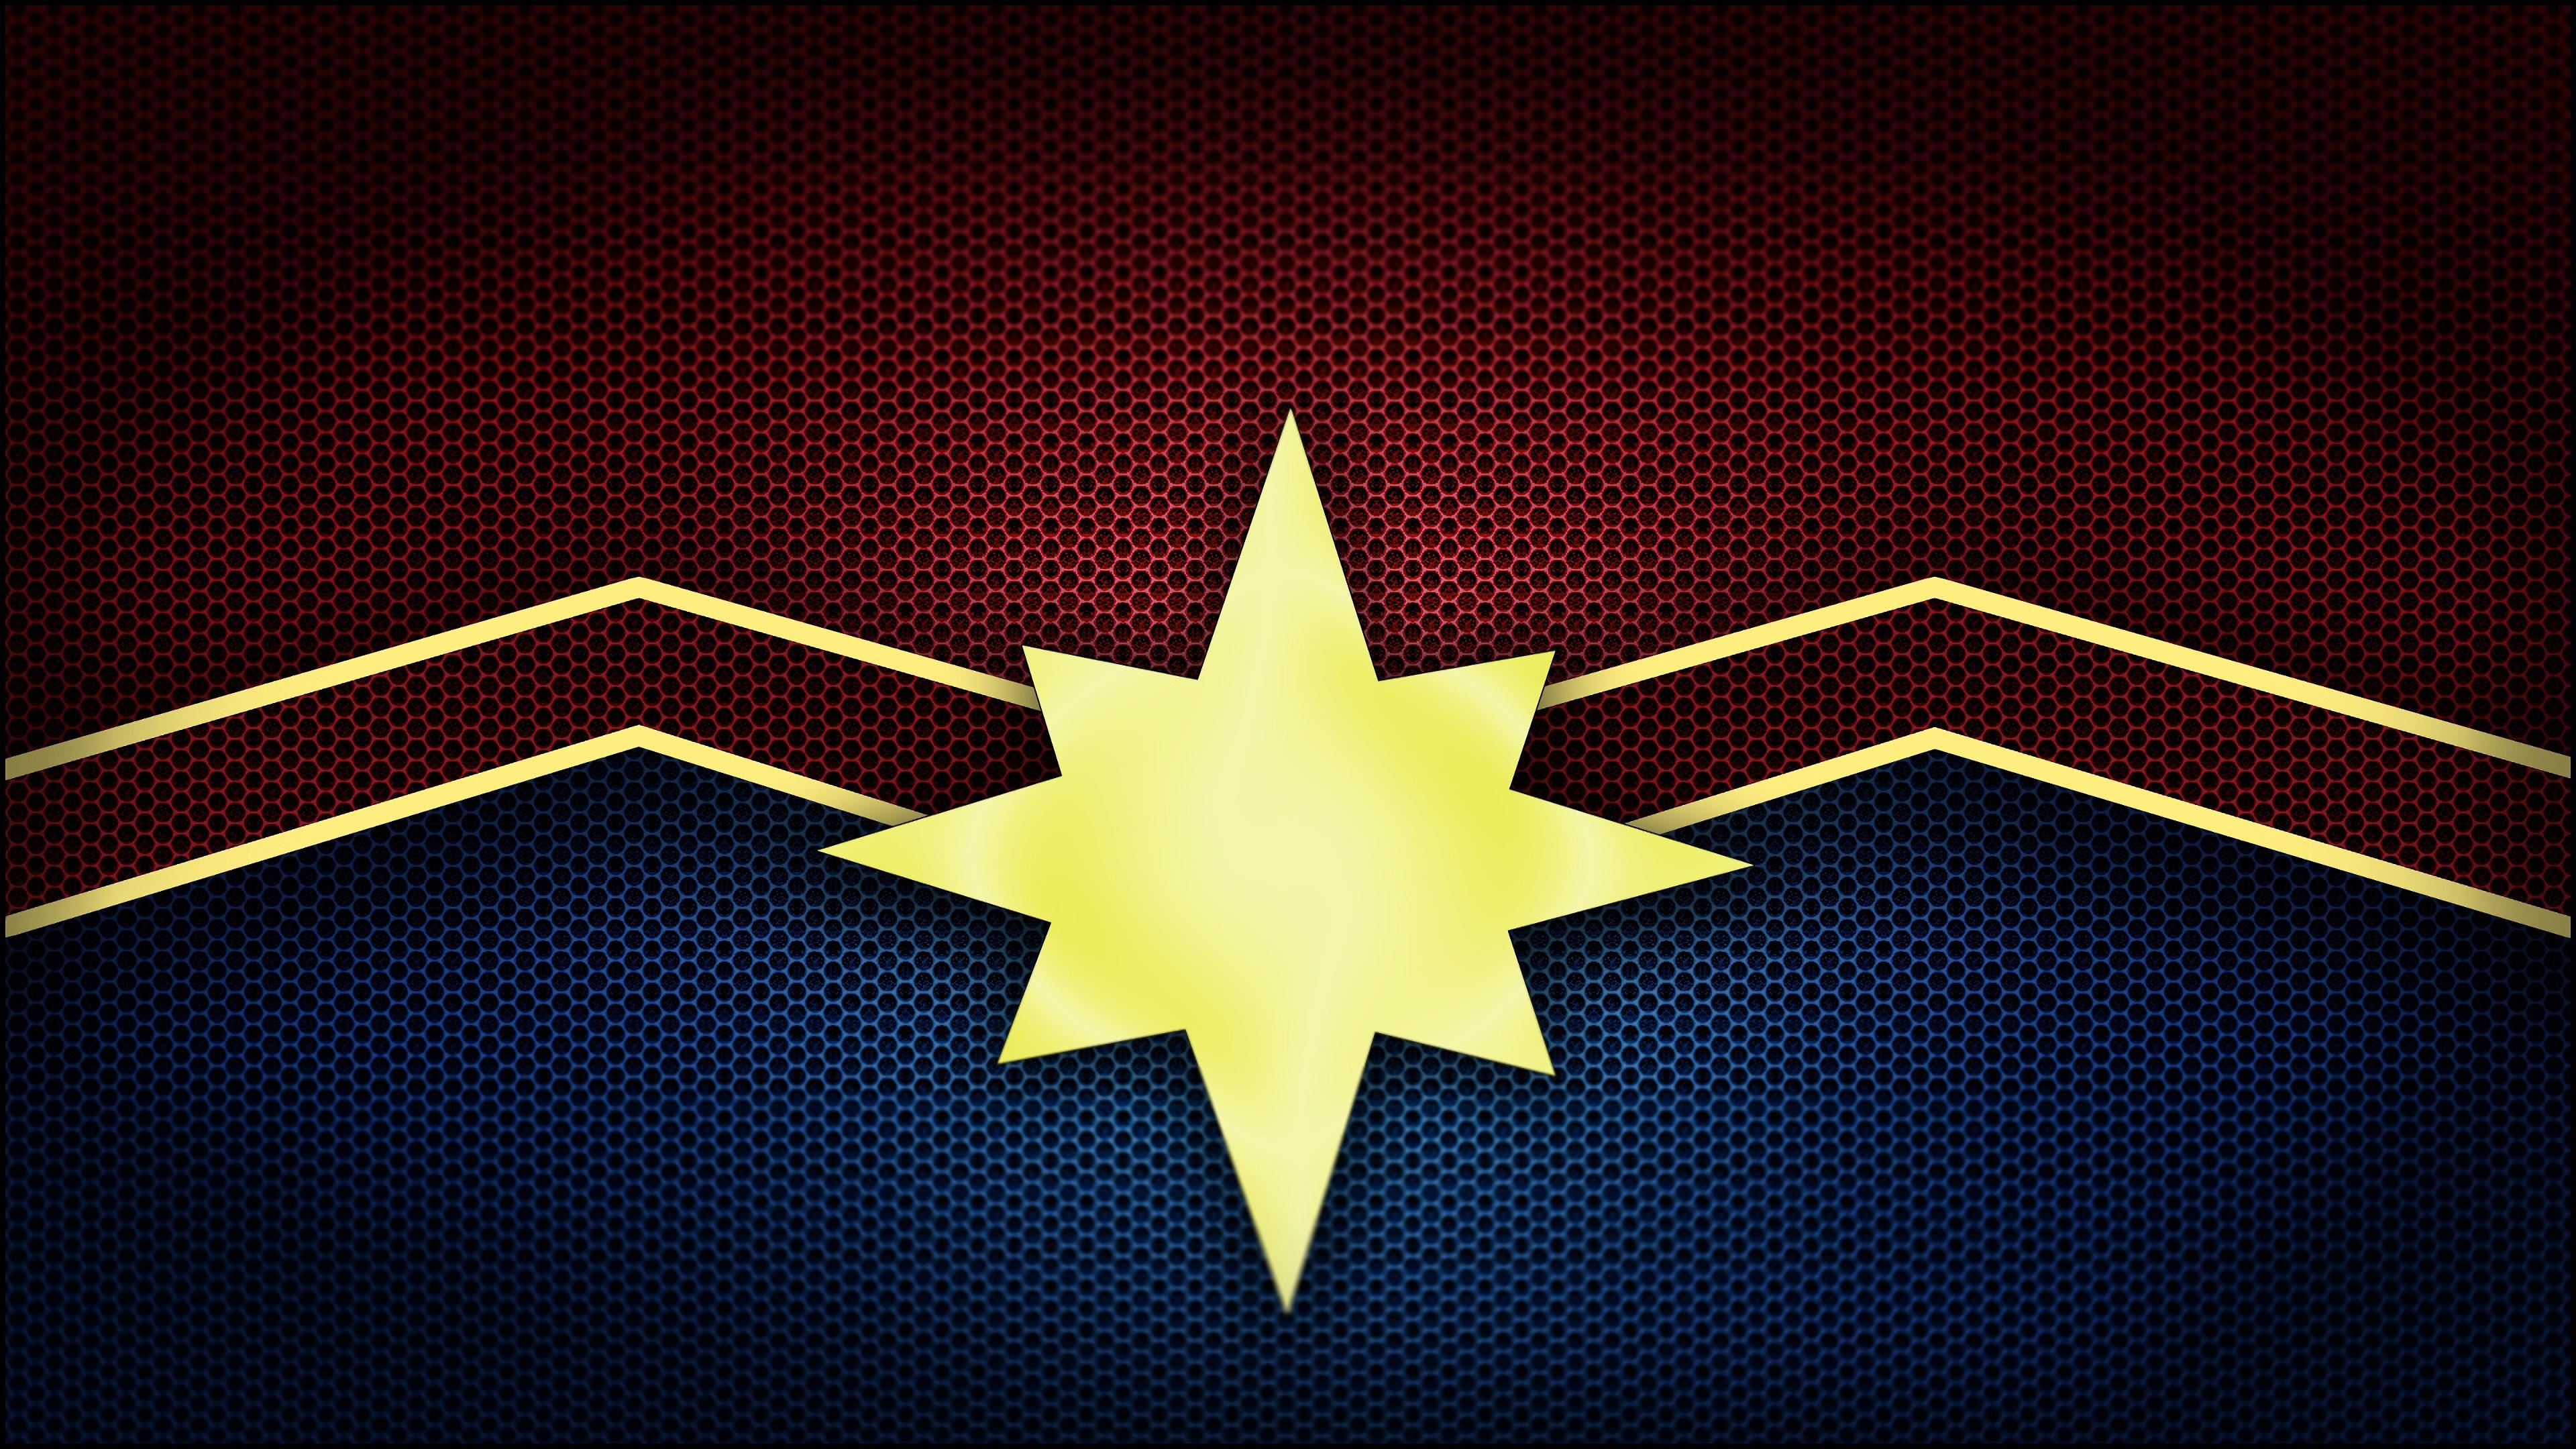 captain marvel movie 2019 logo 4k wallpaper 1544829333 - Captain Marvel Movie 2019 Logo 4K Wallpaper - Captain Marvel (Movie 2019), Captain Marvel (Carol Danvers)